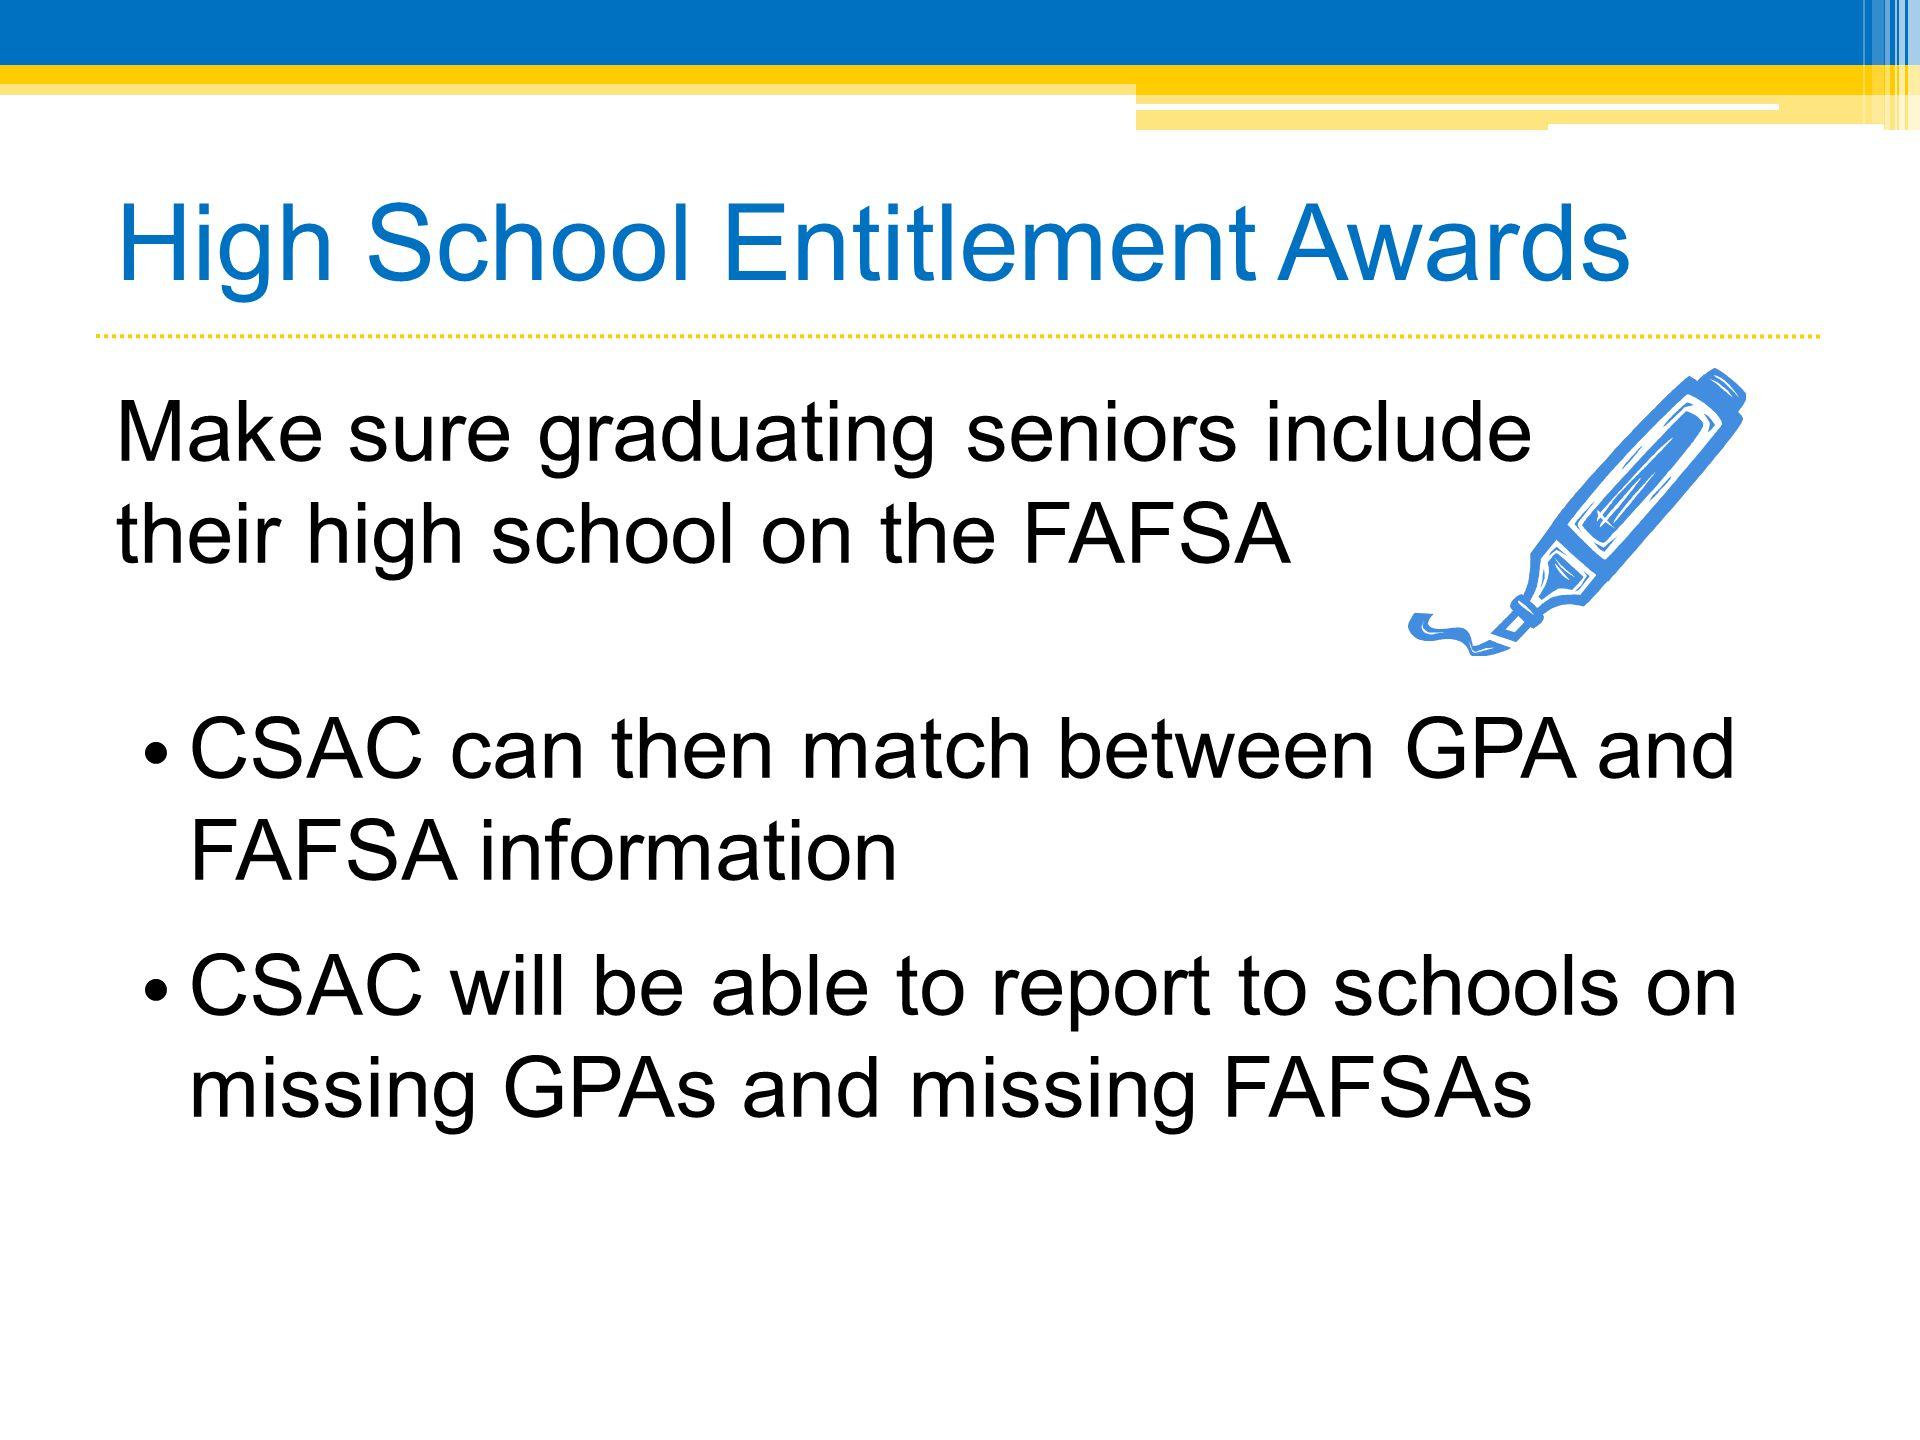 High School Entitlement Awards